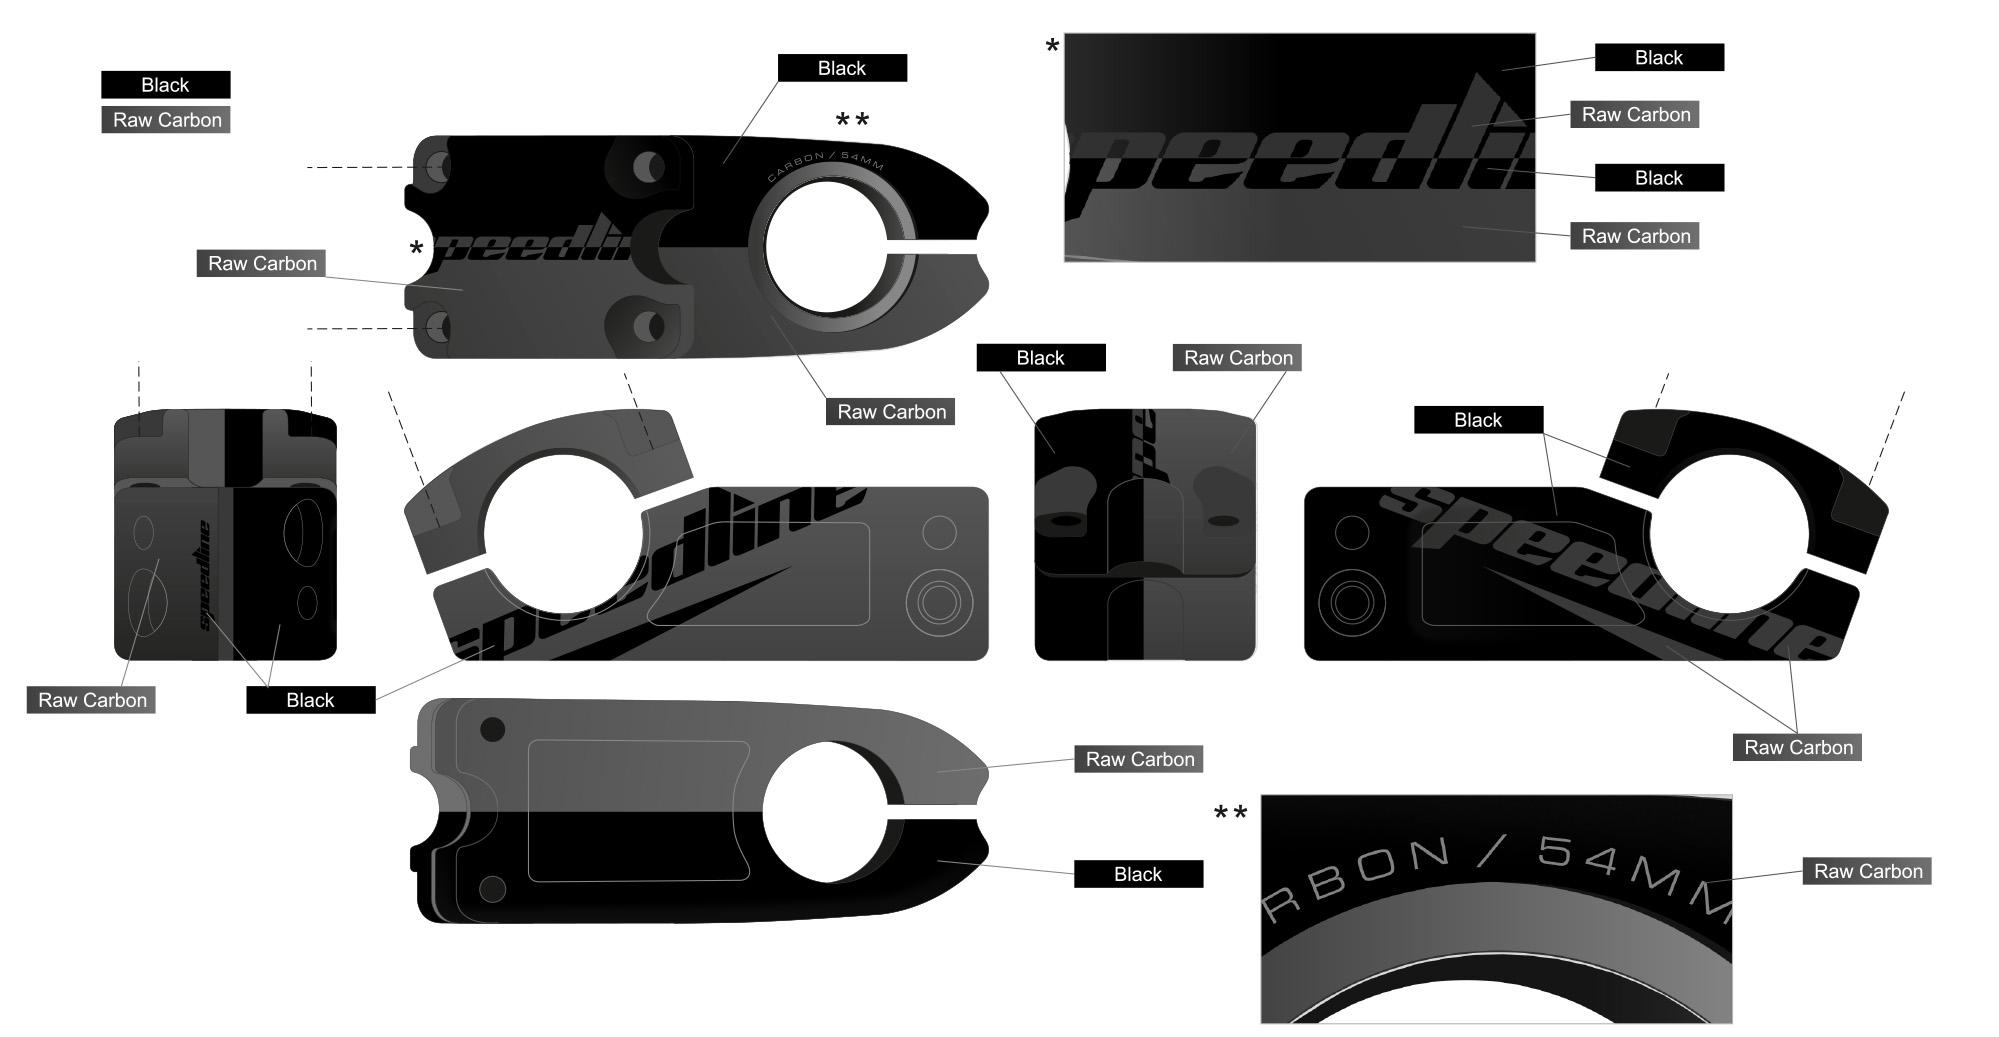 Speedline Matrix Stem Graphics - Raw Carbon Black